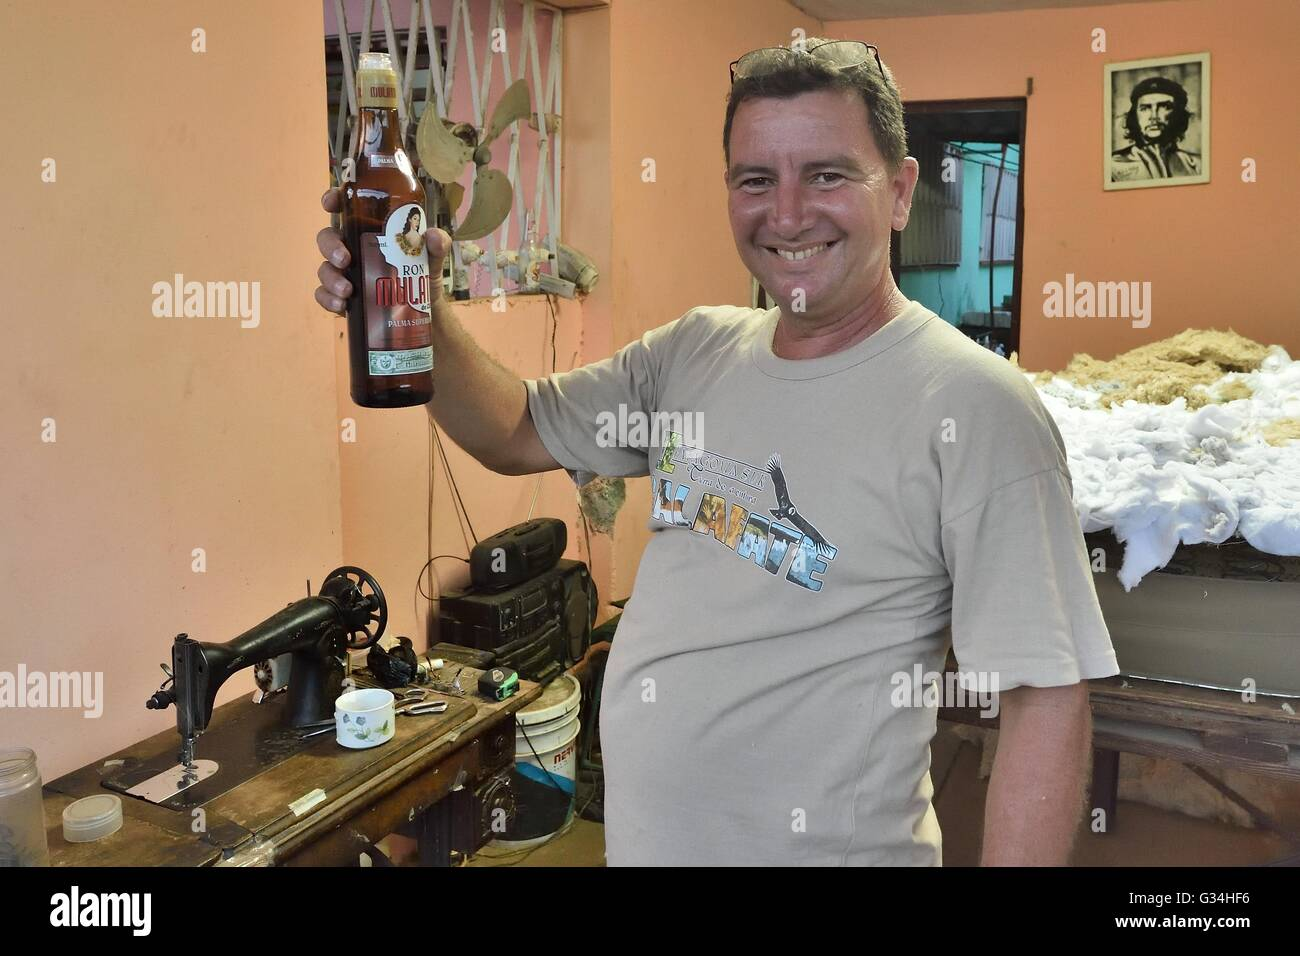 May 13, 2016 - Alamar, Alamar, Cuba - A Cuban worker enjoys some rum at a mattress shop in Alamar, the largest public - Stock Image